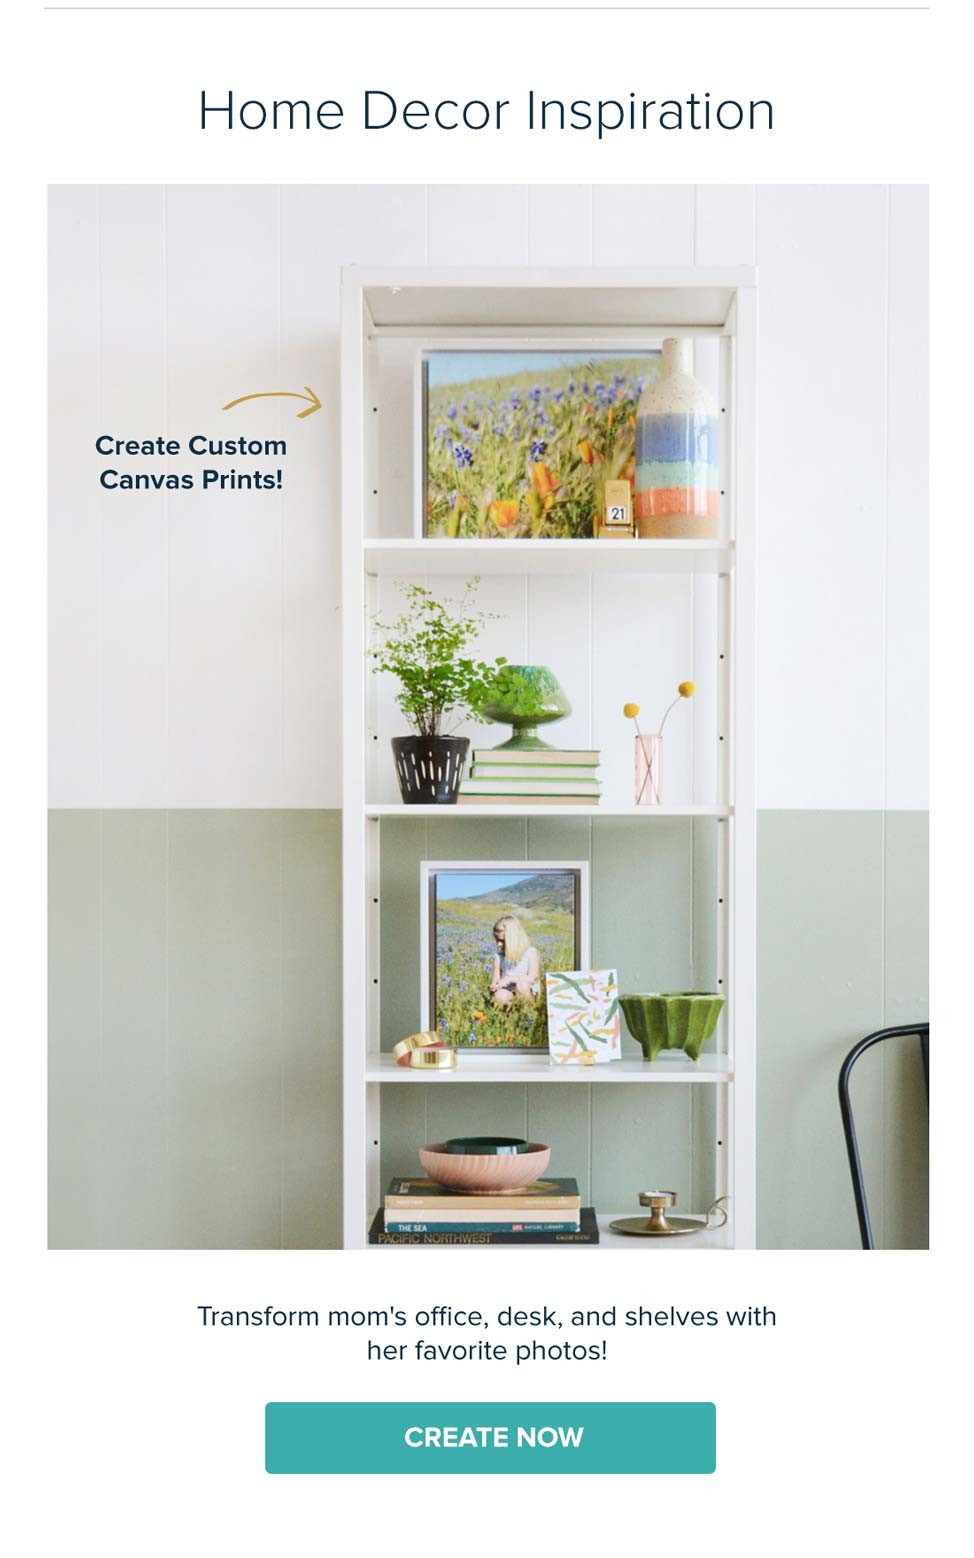 Home Decor Inspiration - Create Now